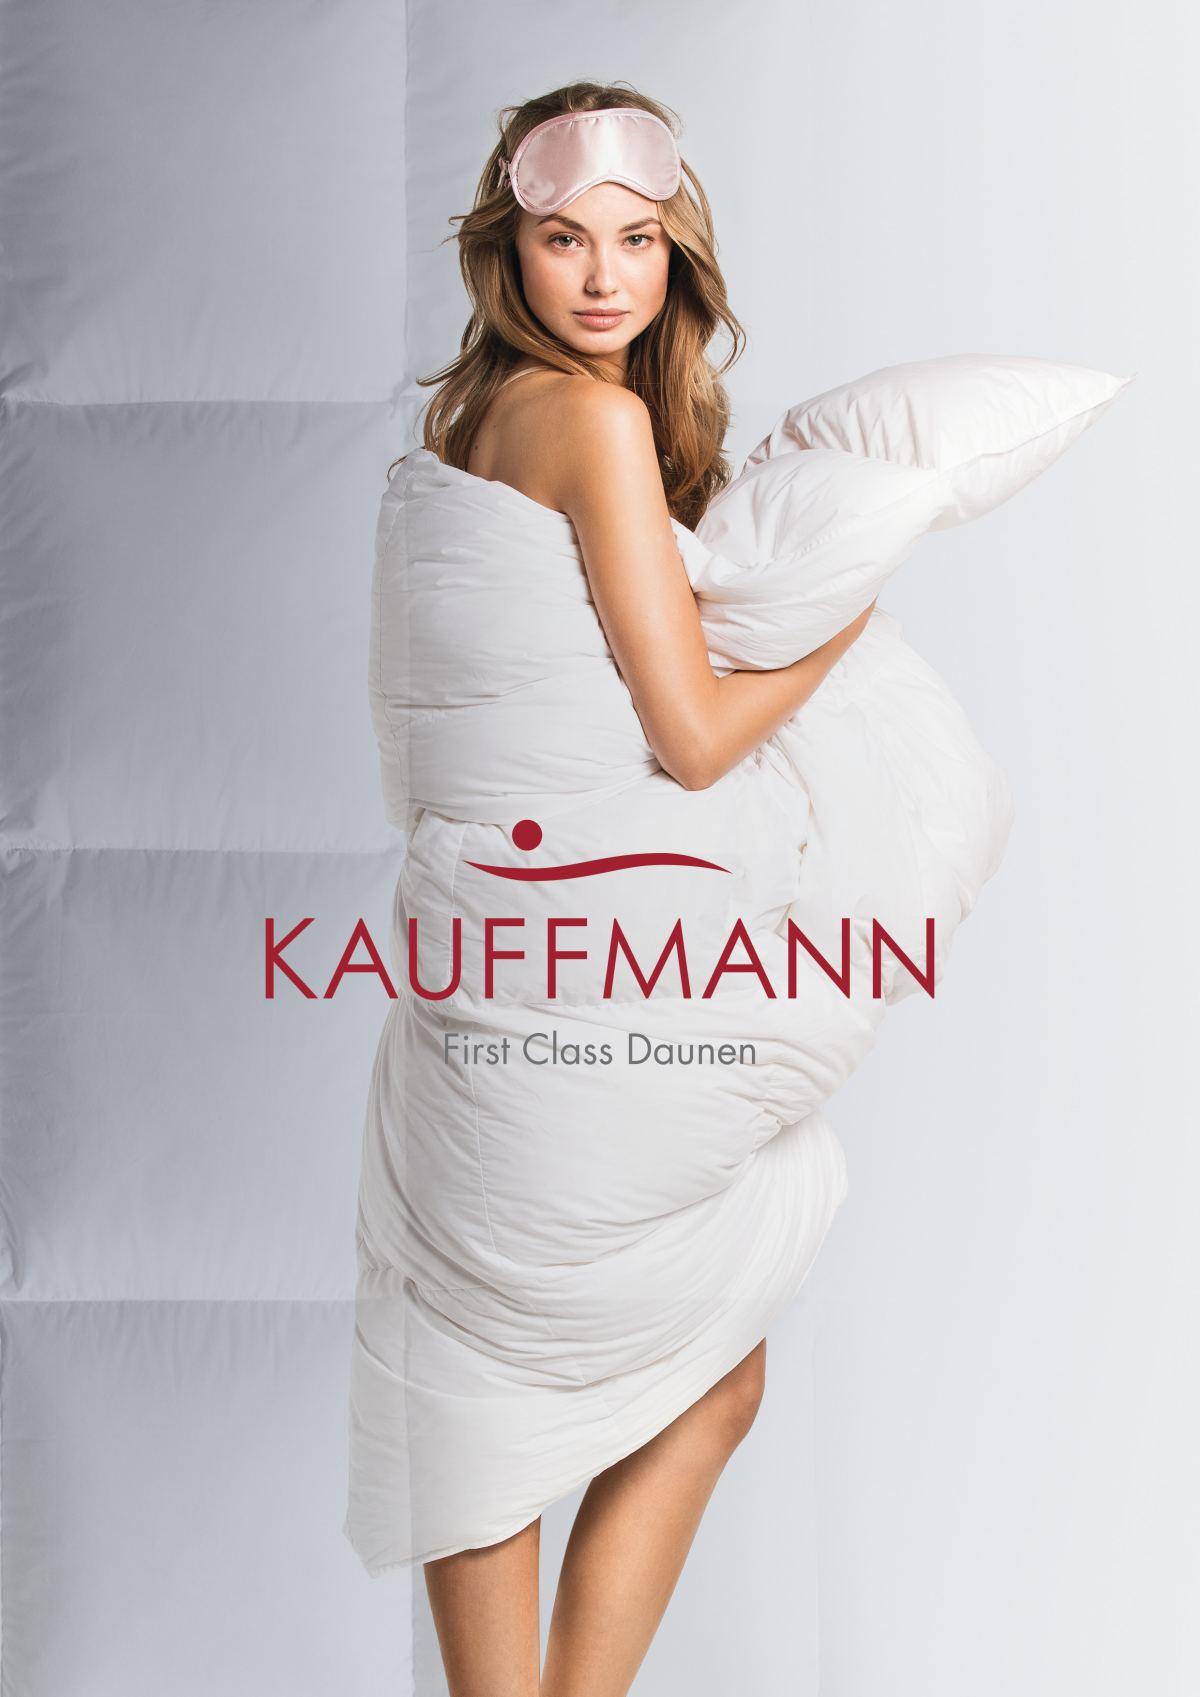 Kauffmann_Titel_RZ